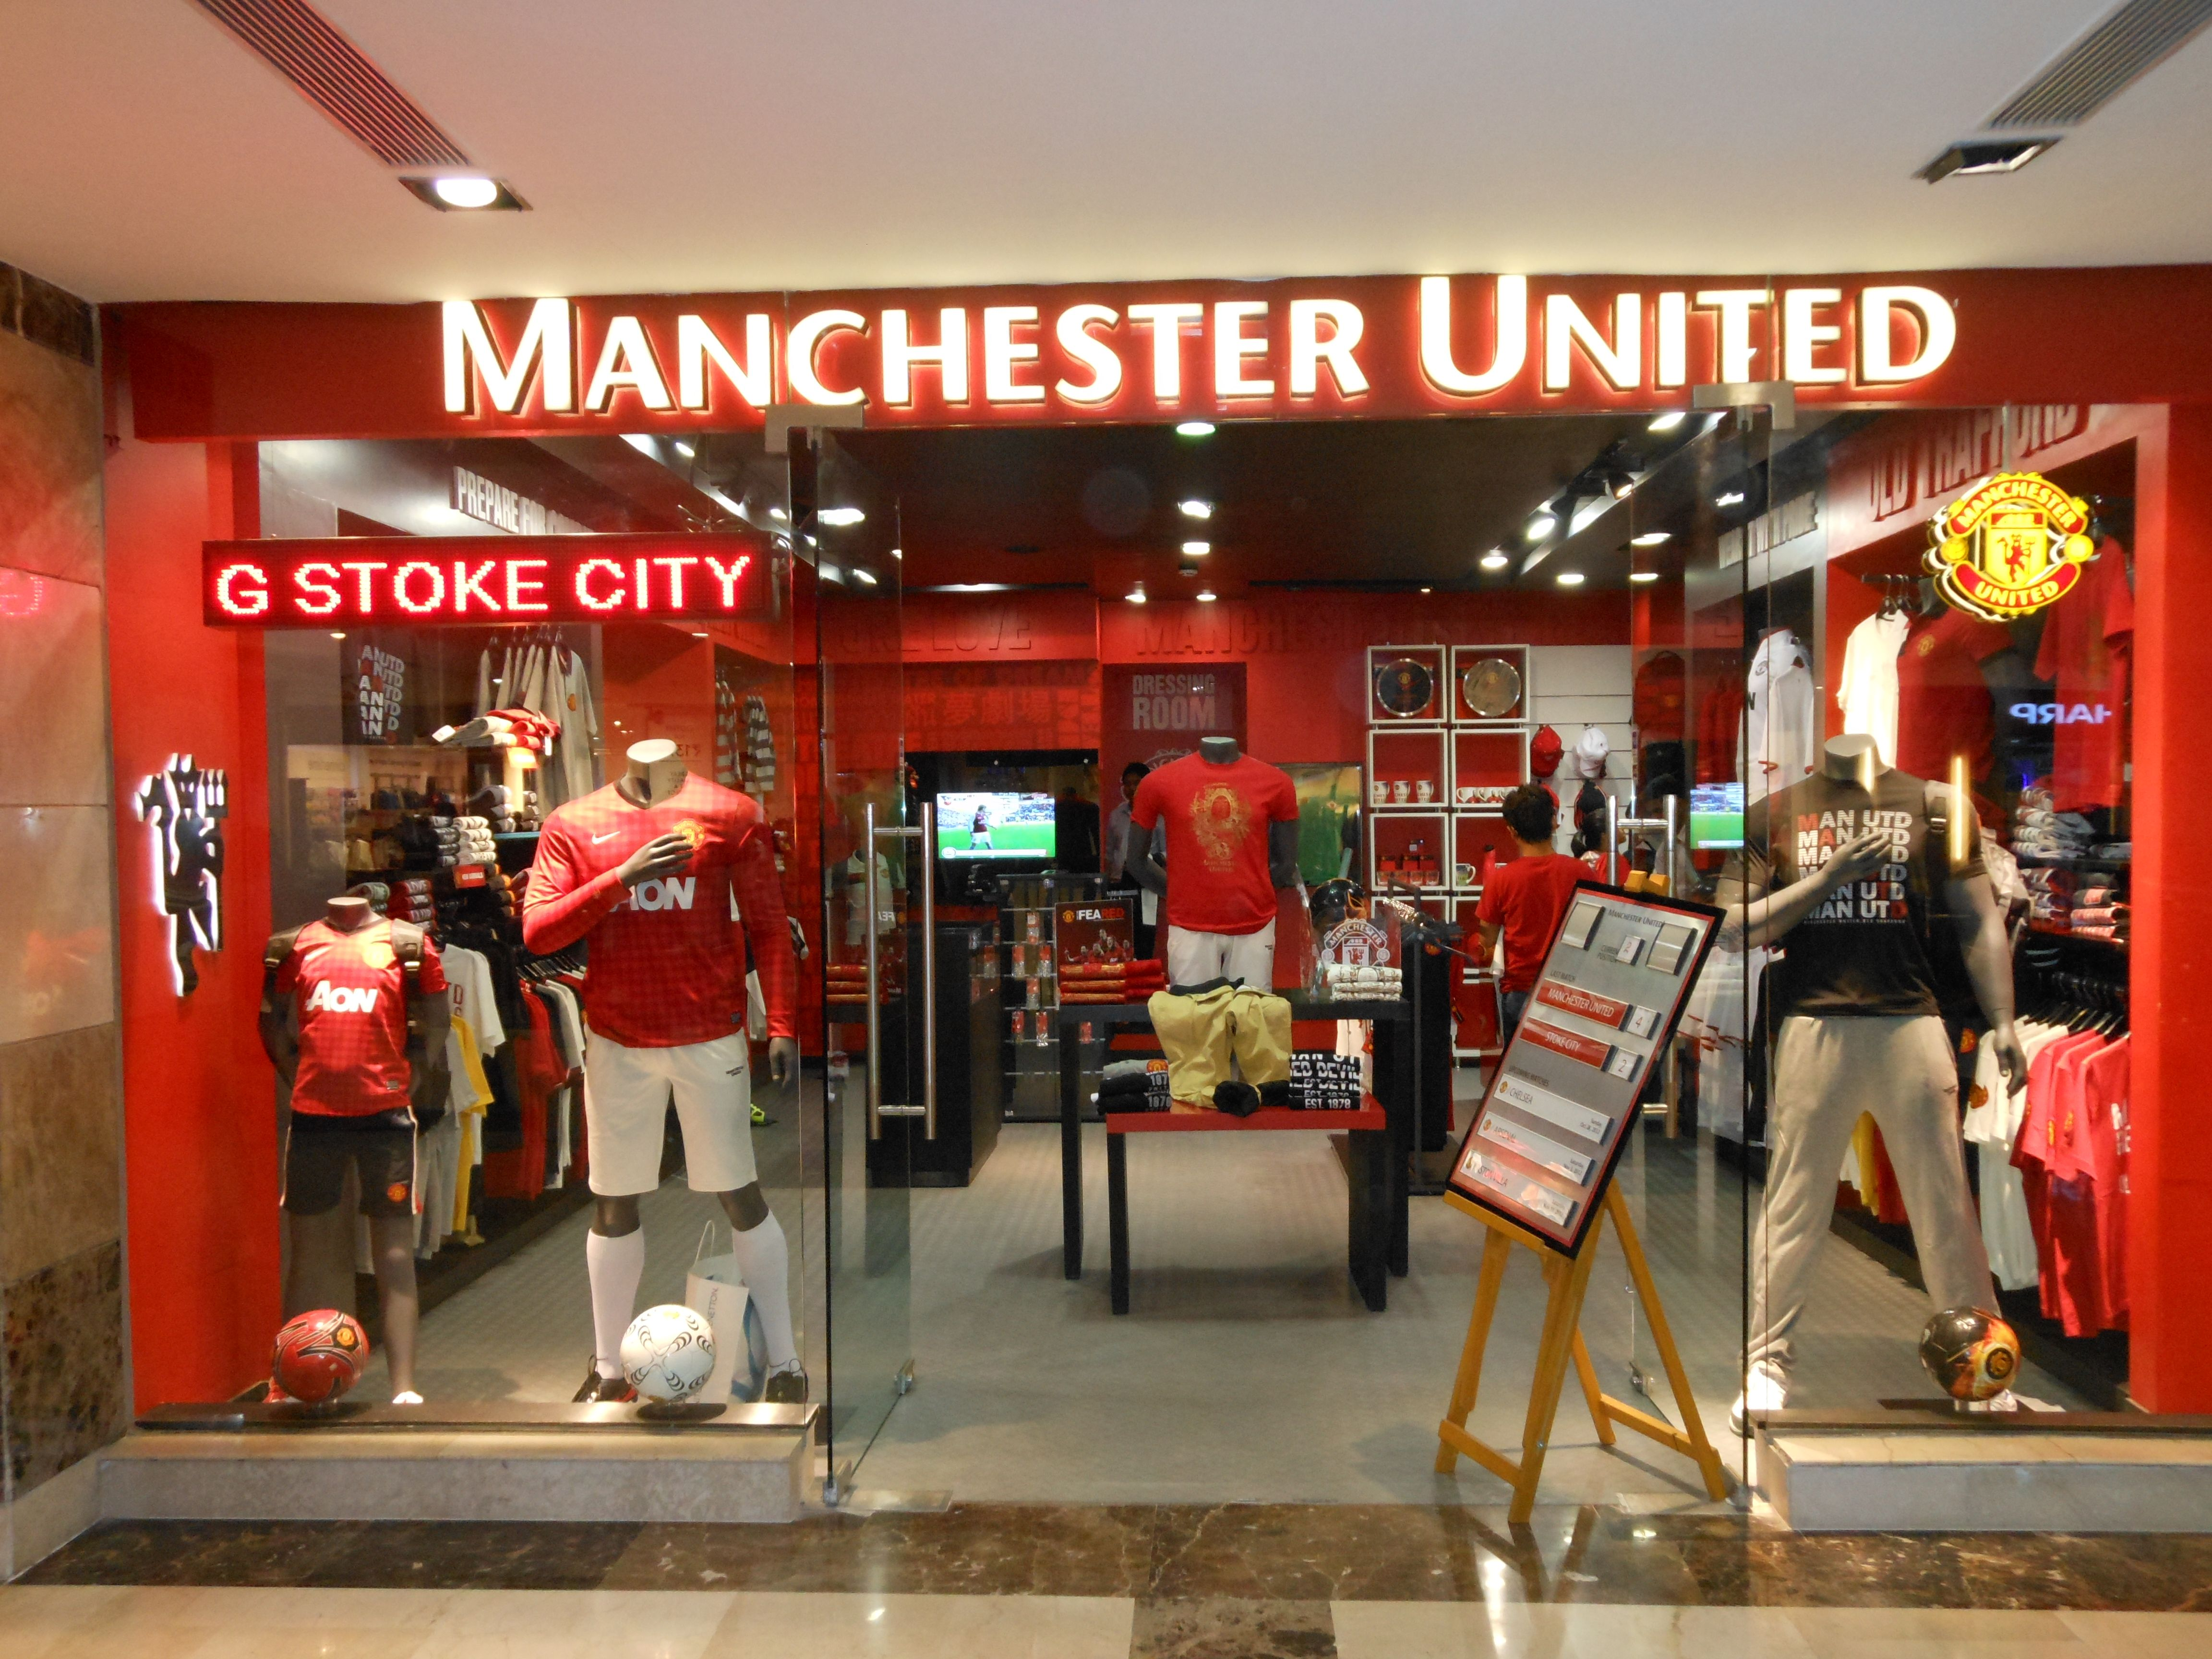 Browse Manchester United Store for the latest Man Utd jerseys training jerseys replica jerseys and more for men women and kids. Manchester United Store Mumbai Store Design Manchester United Store Design Retail Design